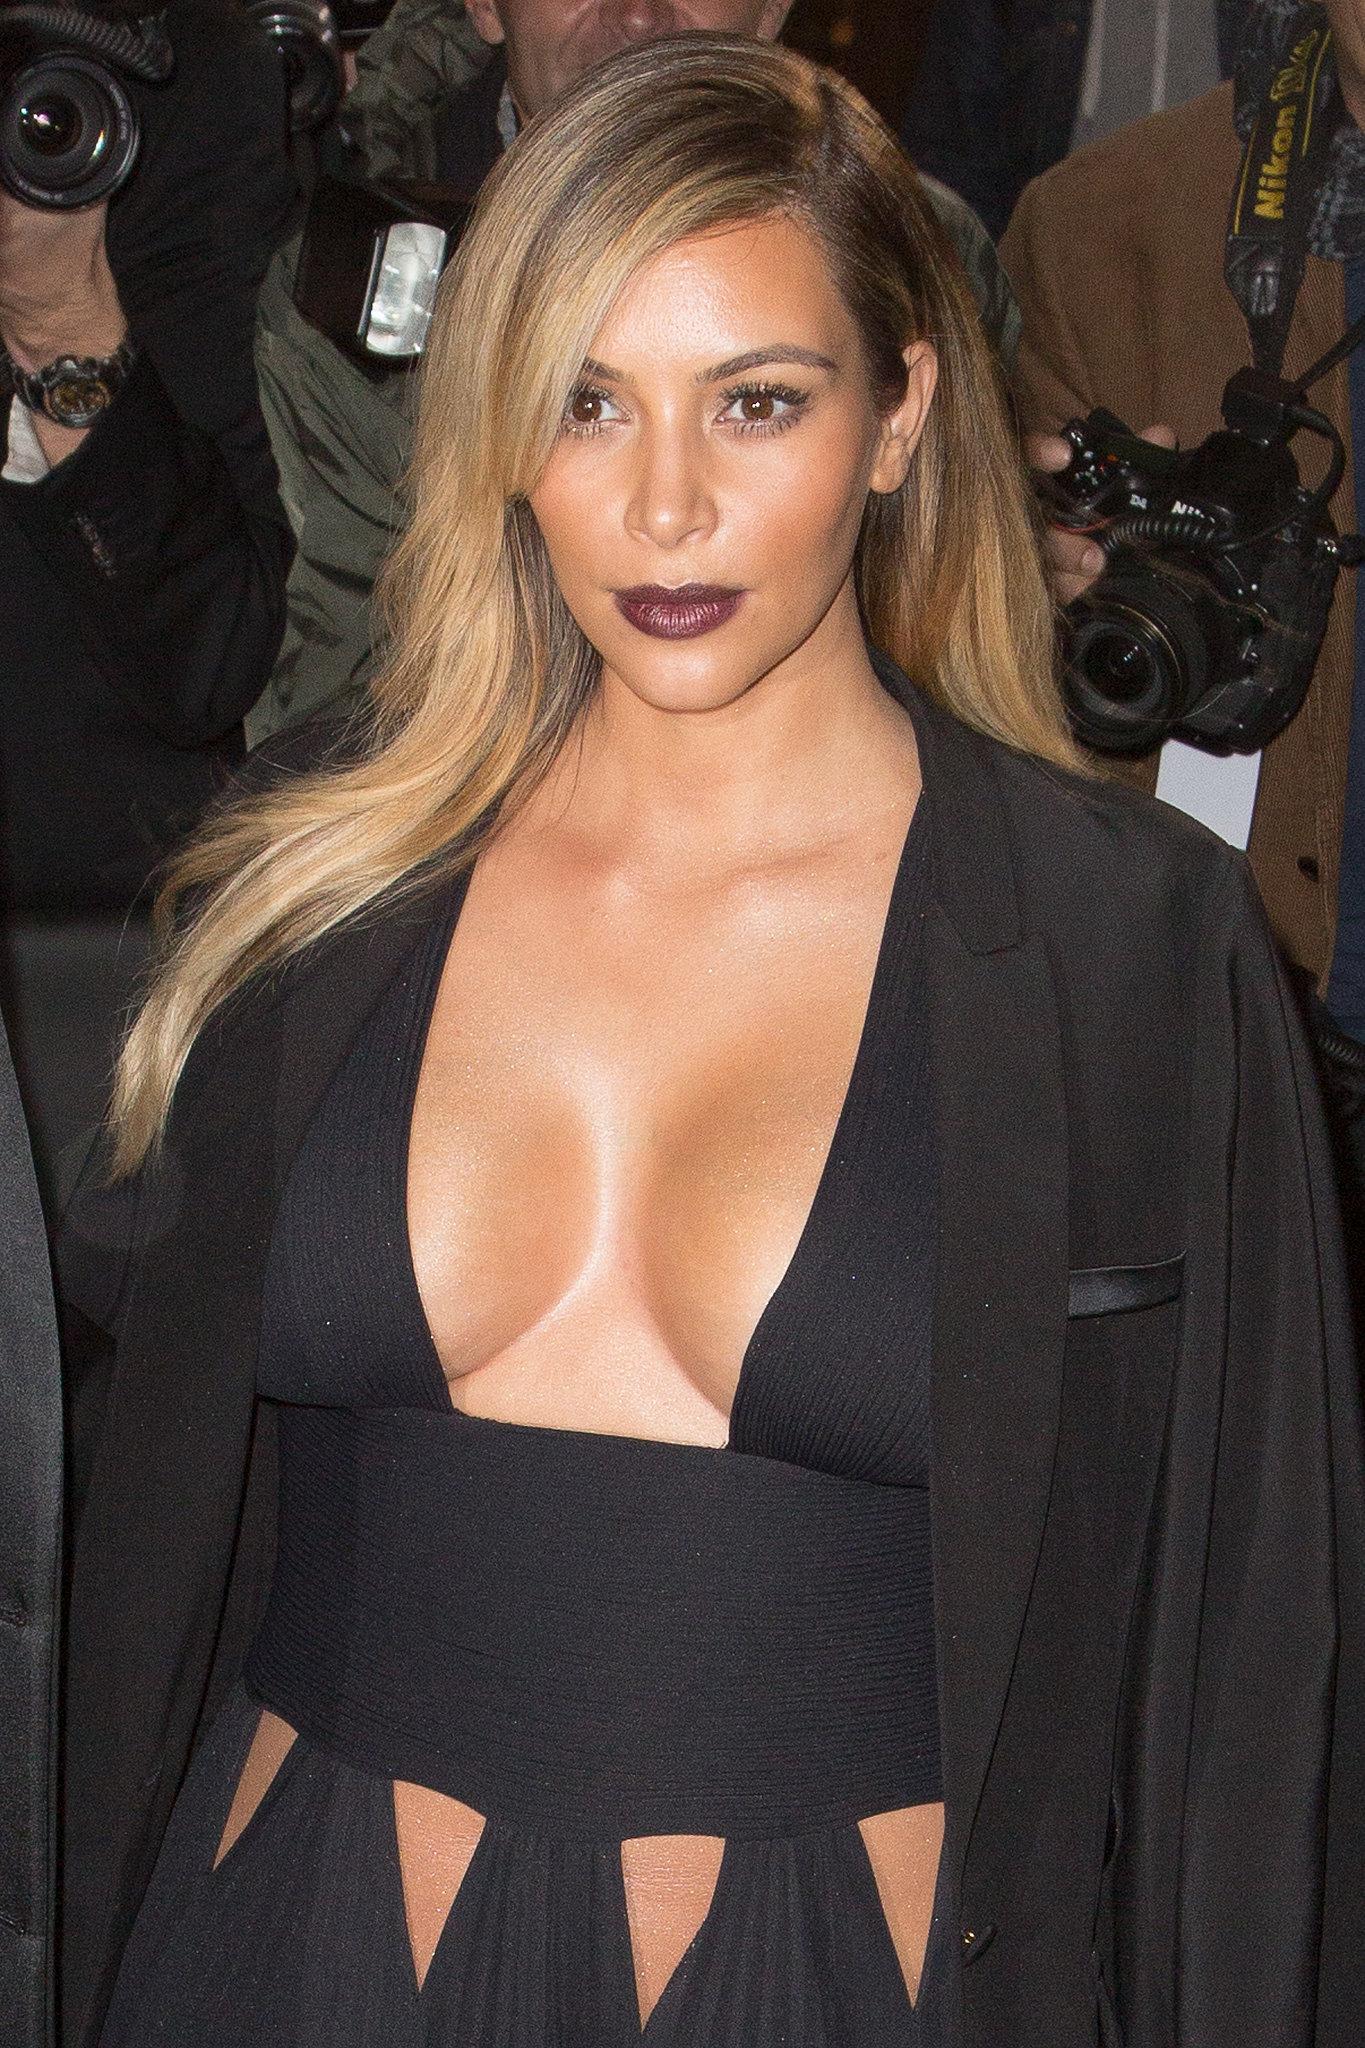 Kim Kardashian at the Mademoiselle C Cocktail Party